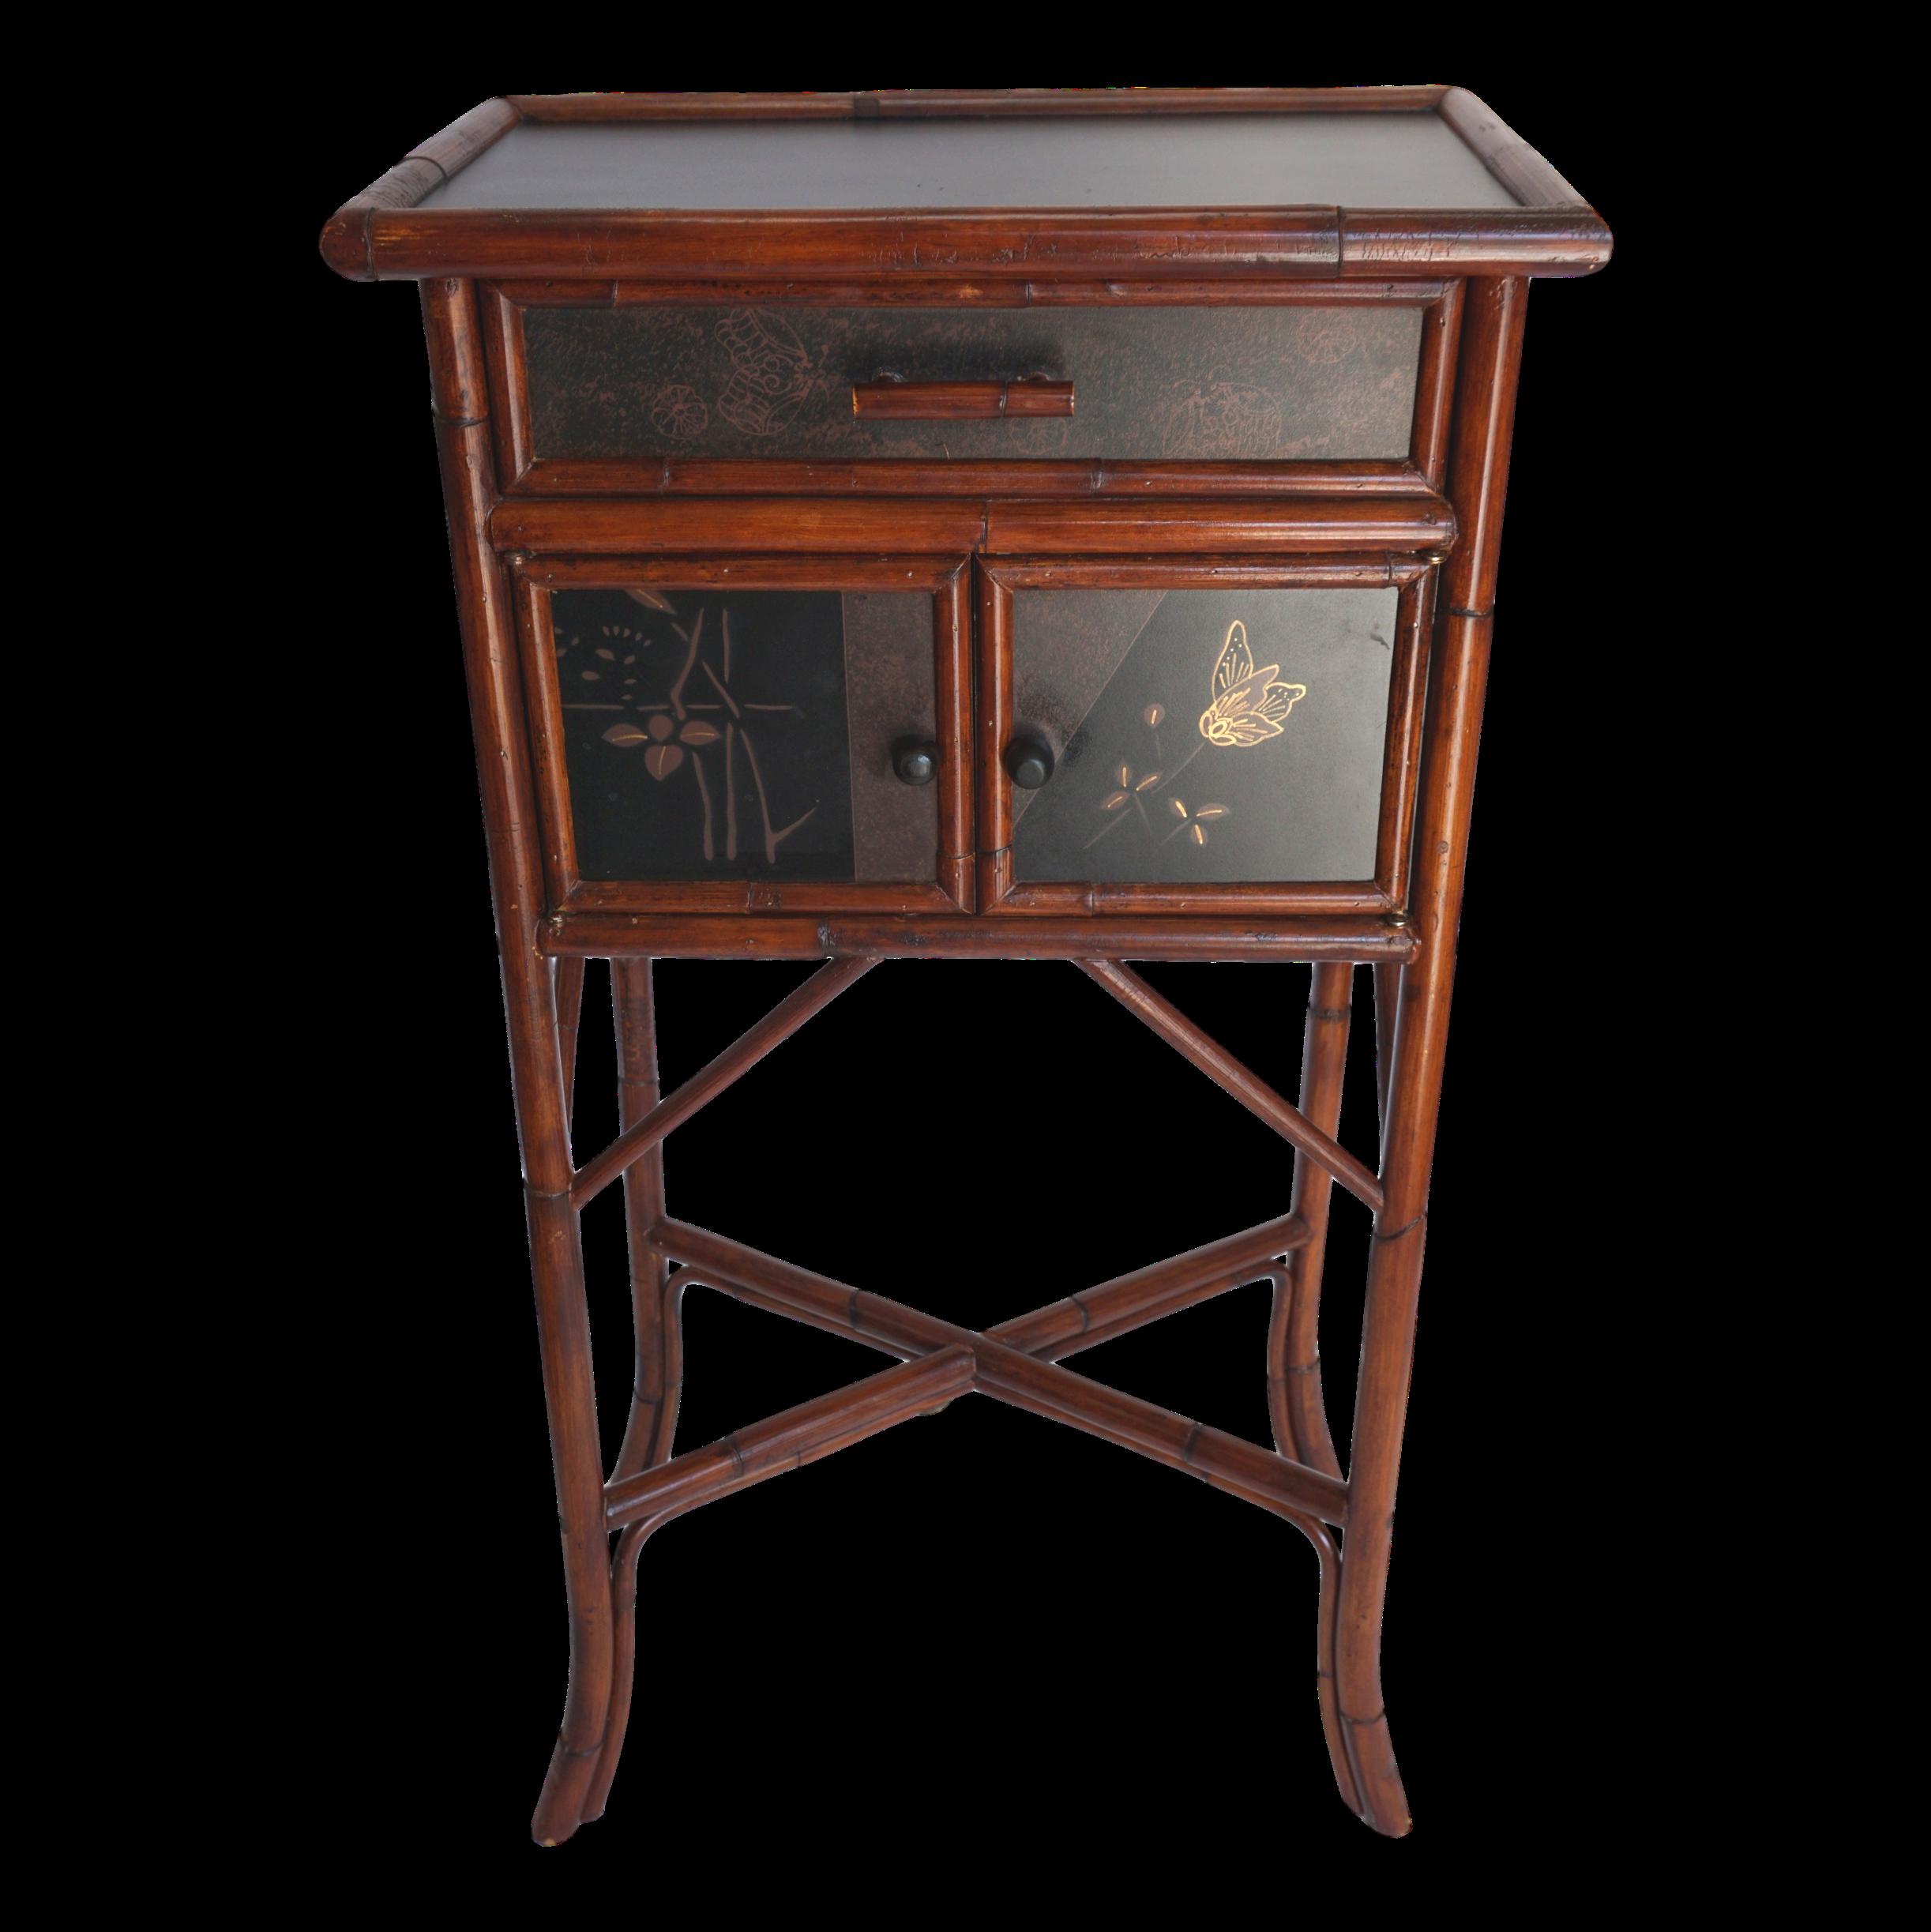 Terrific Vintage Palecek Small Bamboo End Table Ethnic Decor For Interior Design Ideas Tzicisoteloinfo